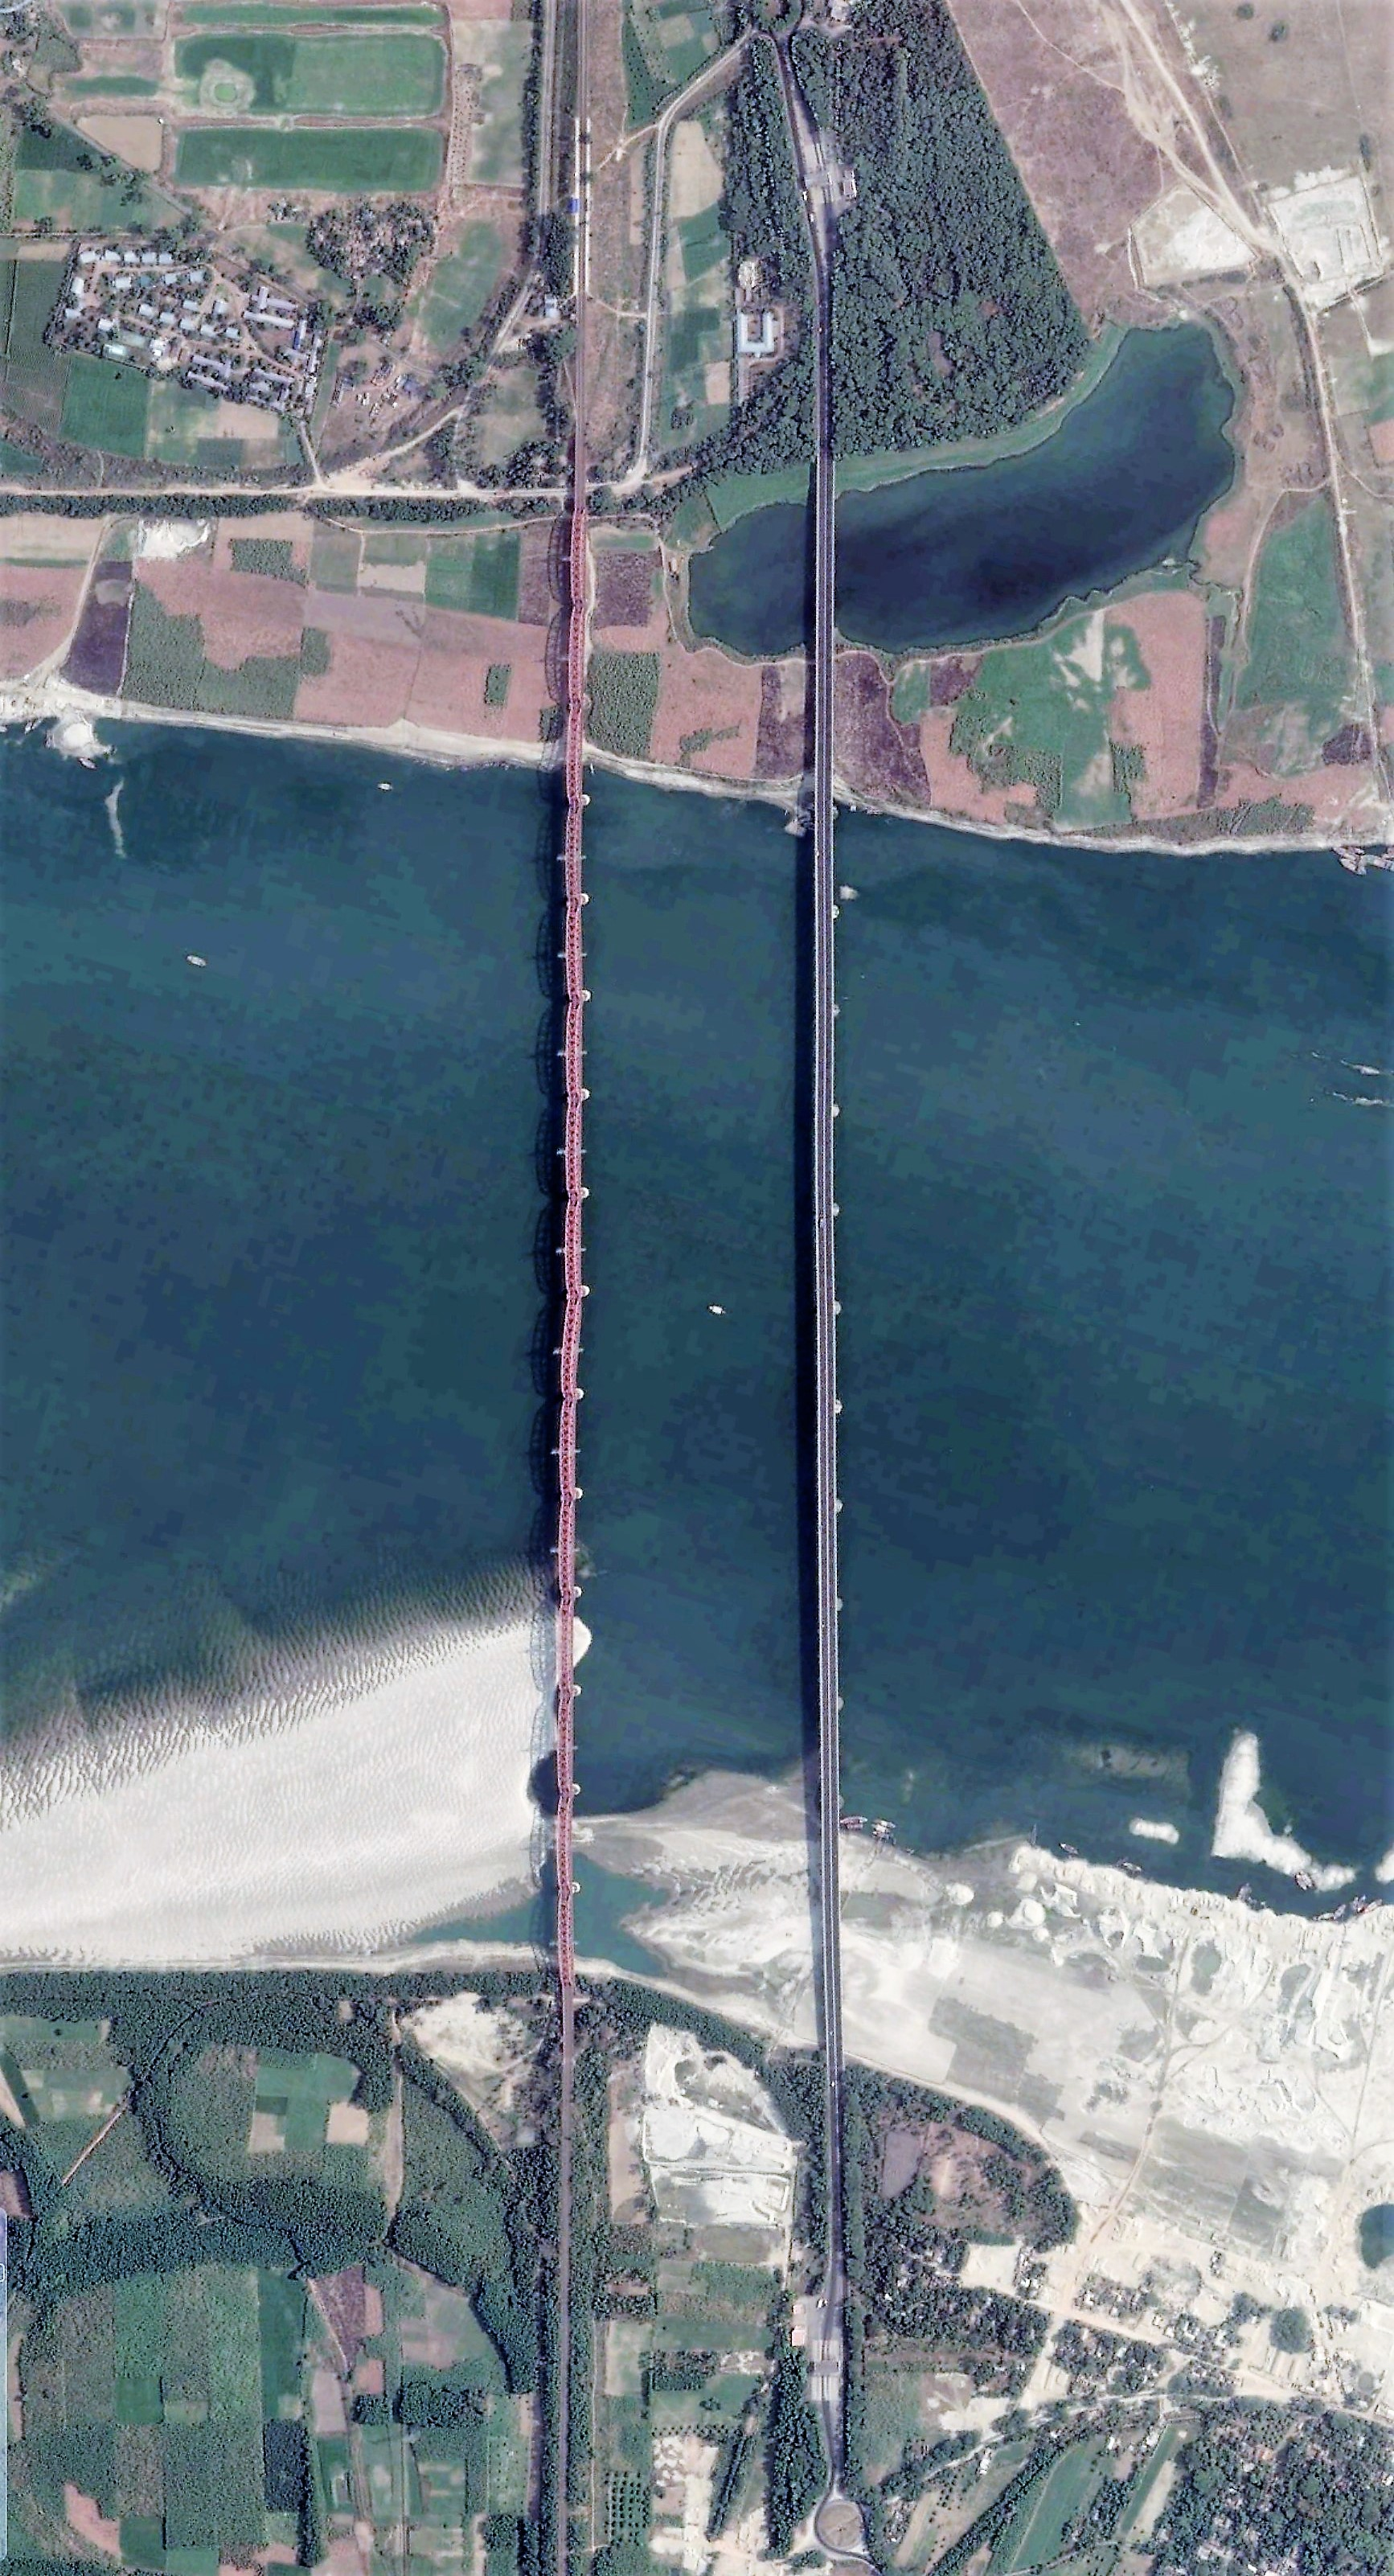 Hardinge bridge (left) and Lalon Shah bridge (right) in May 2015. Image width: 400 meters